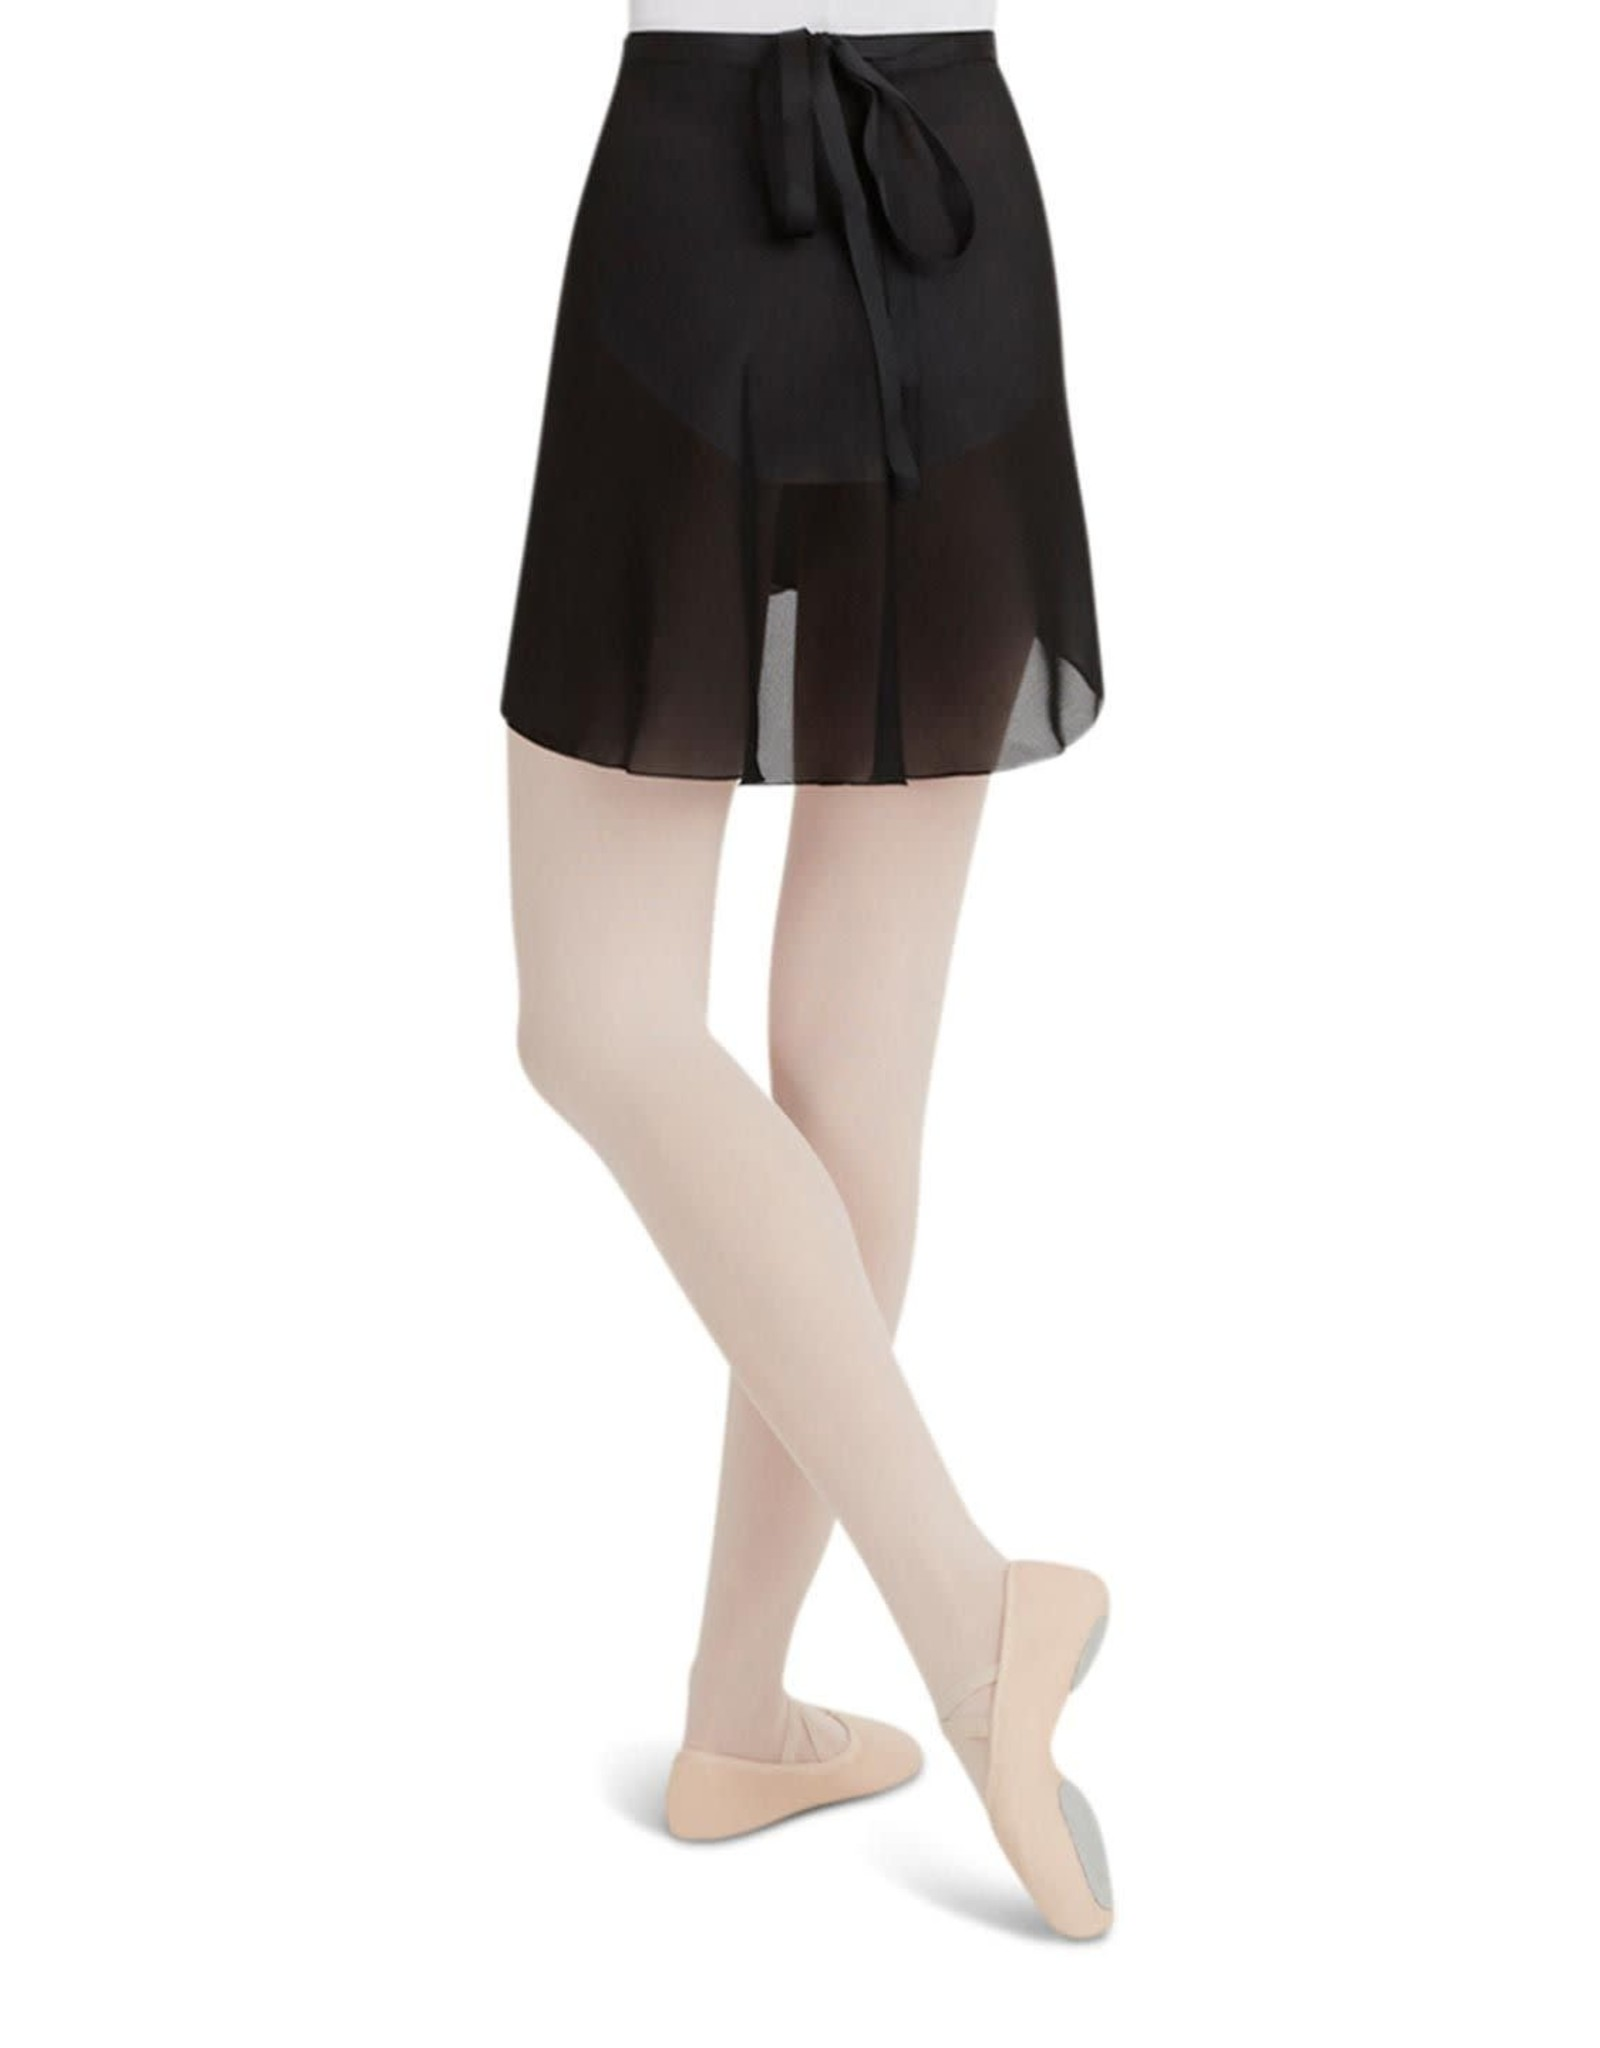 Capezio Elegant Black Georgette Wrap Skirt